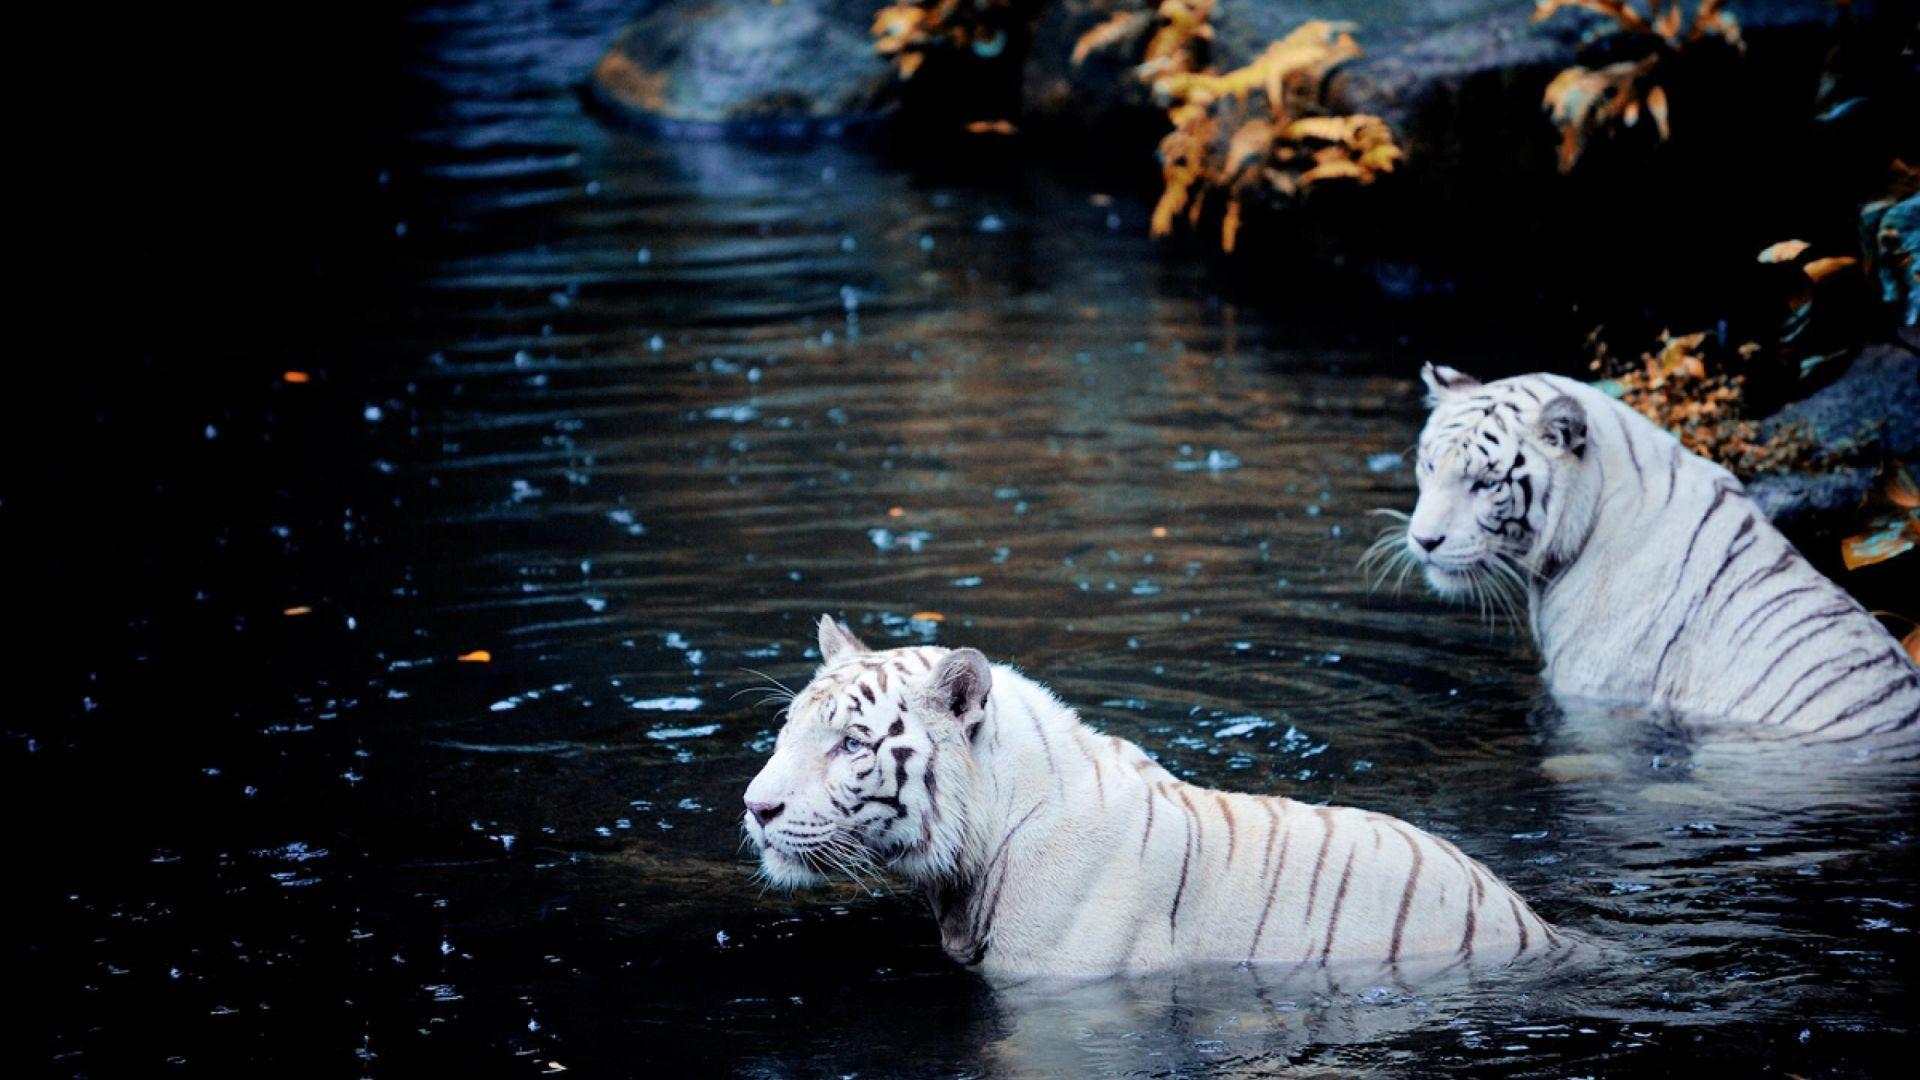 White Tiger swiming, Cool HD Wallpaper